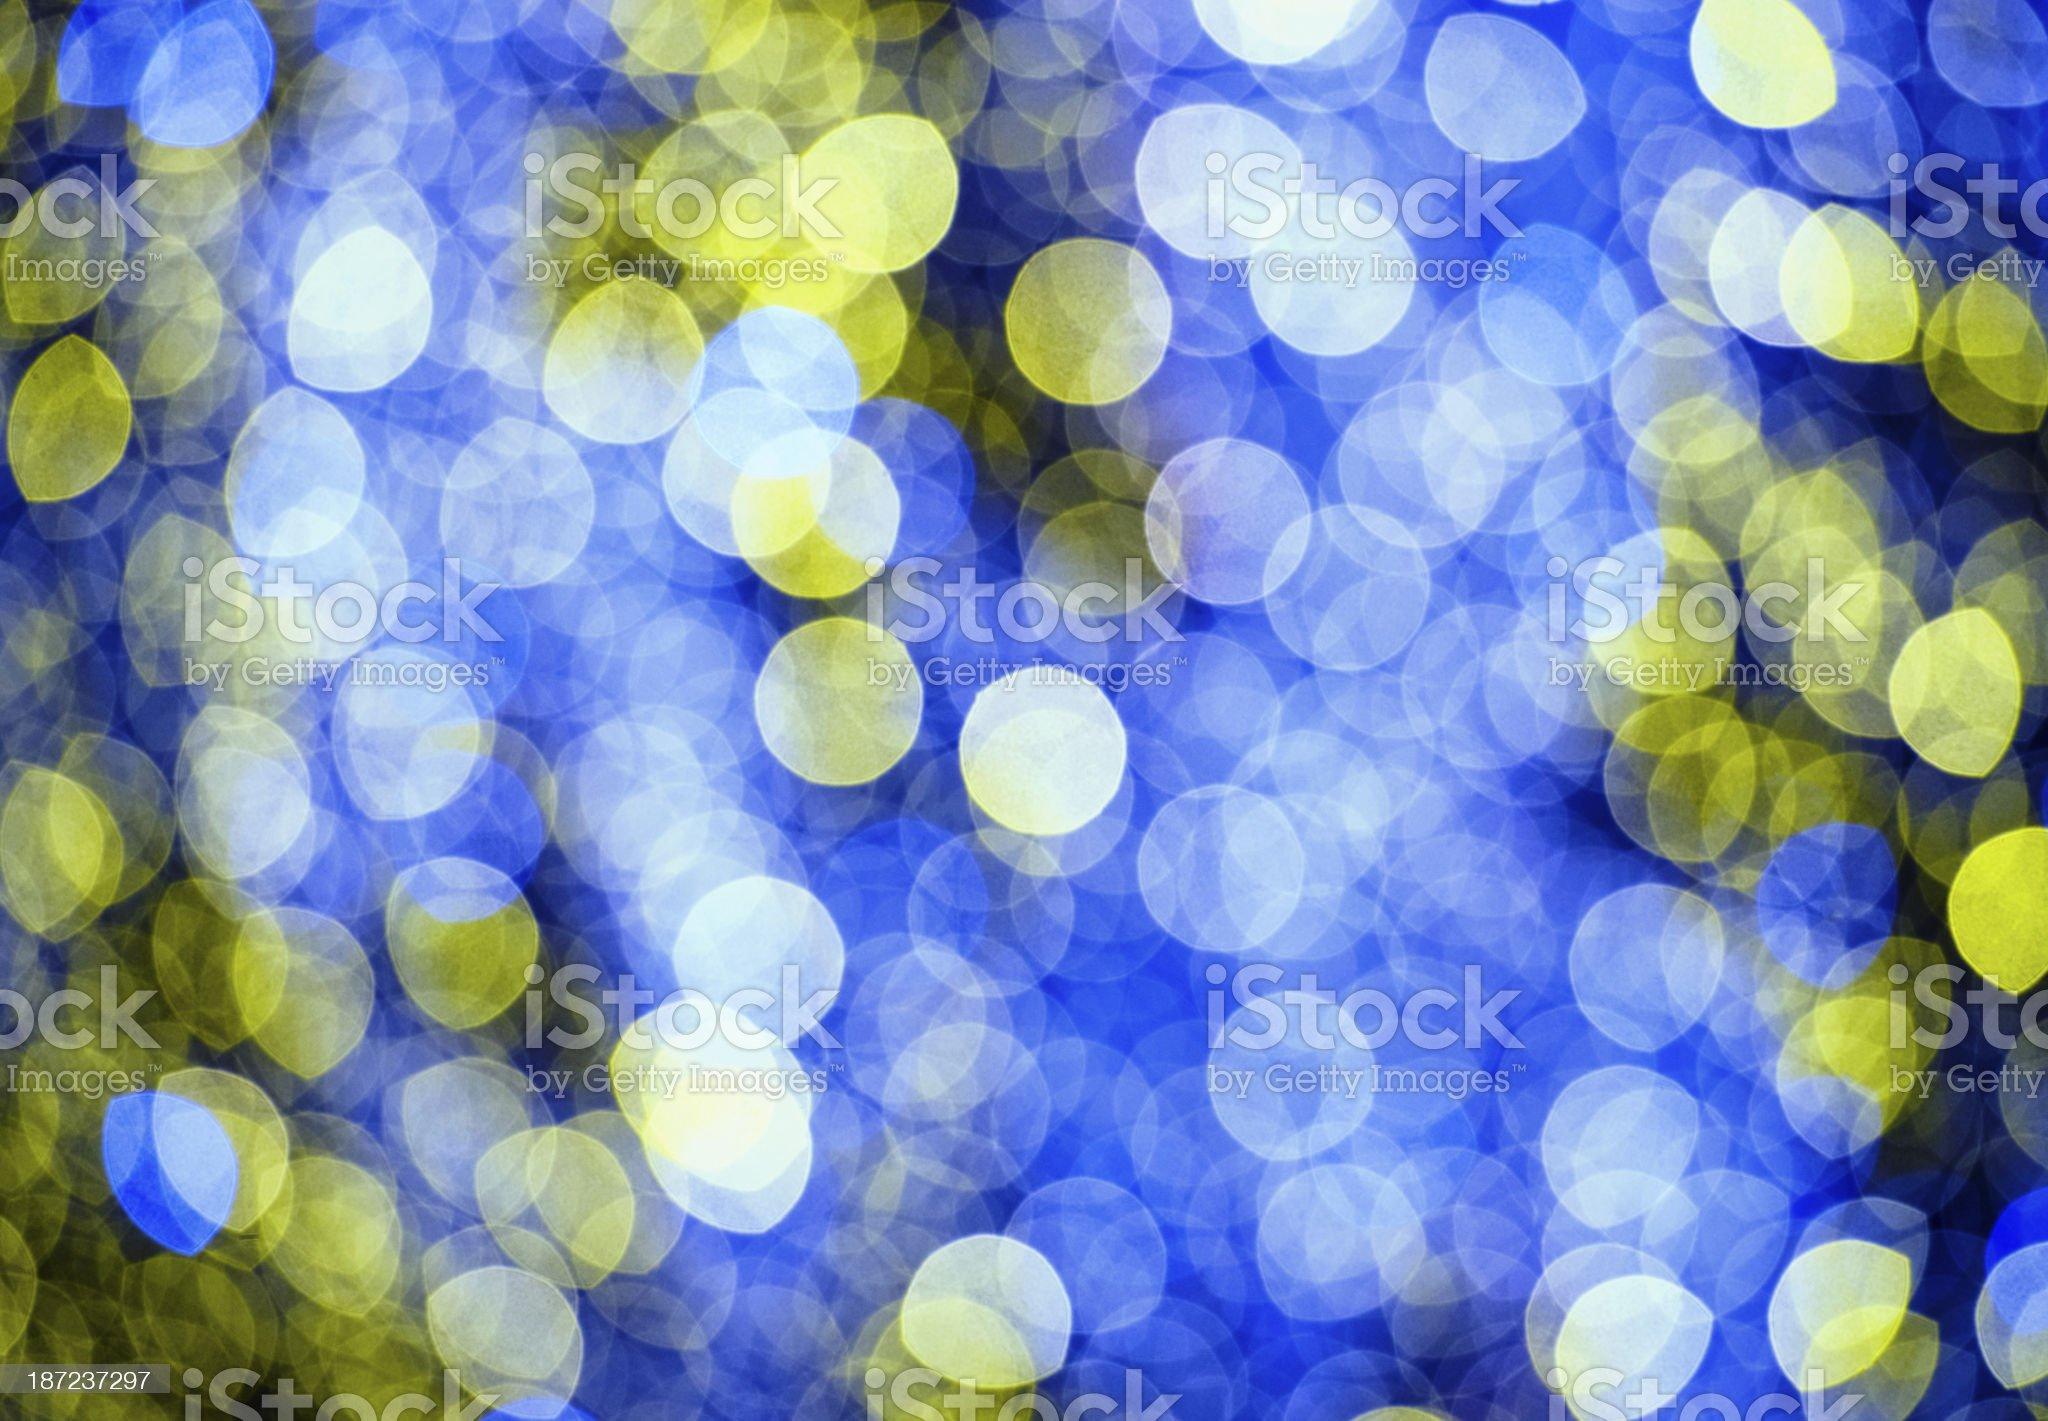 Defocused Christmas Lights Background royalty-free stock photo